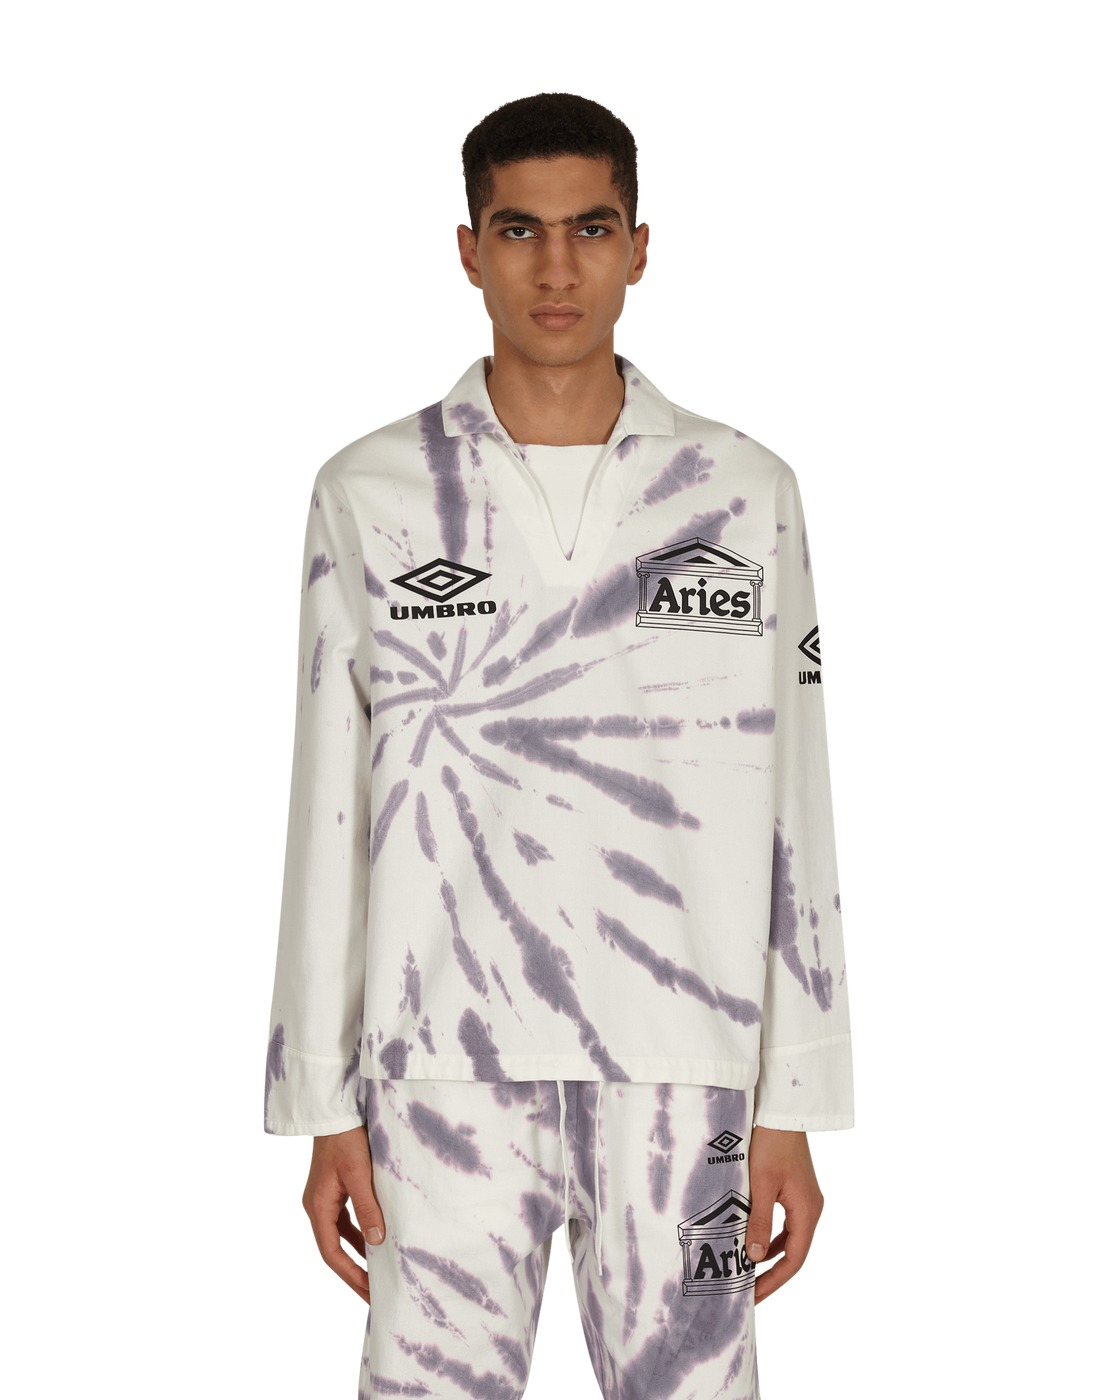 Aries Umbro Tie Dye Pro 64 Pullover White/Dusk